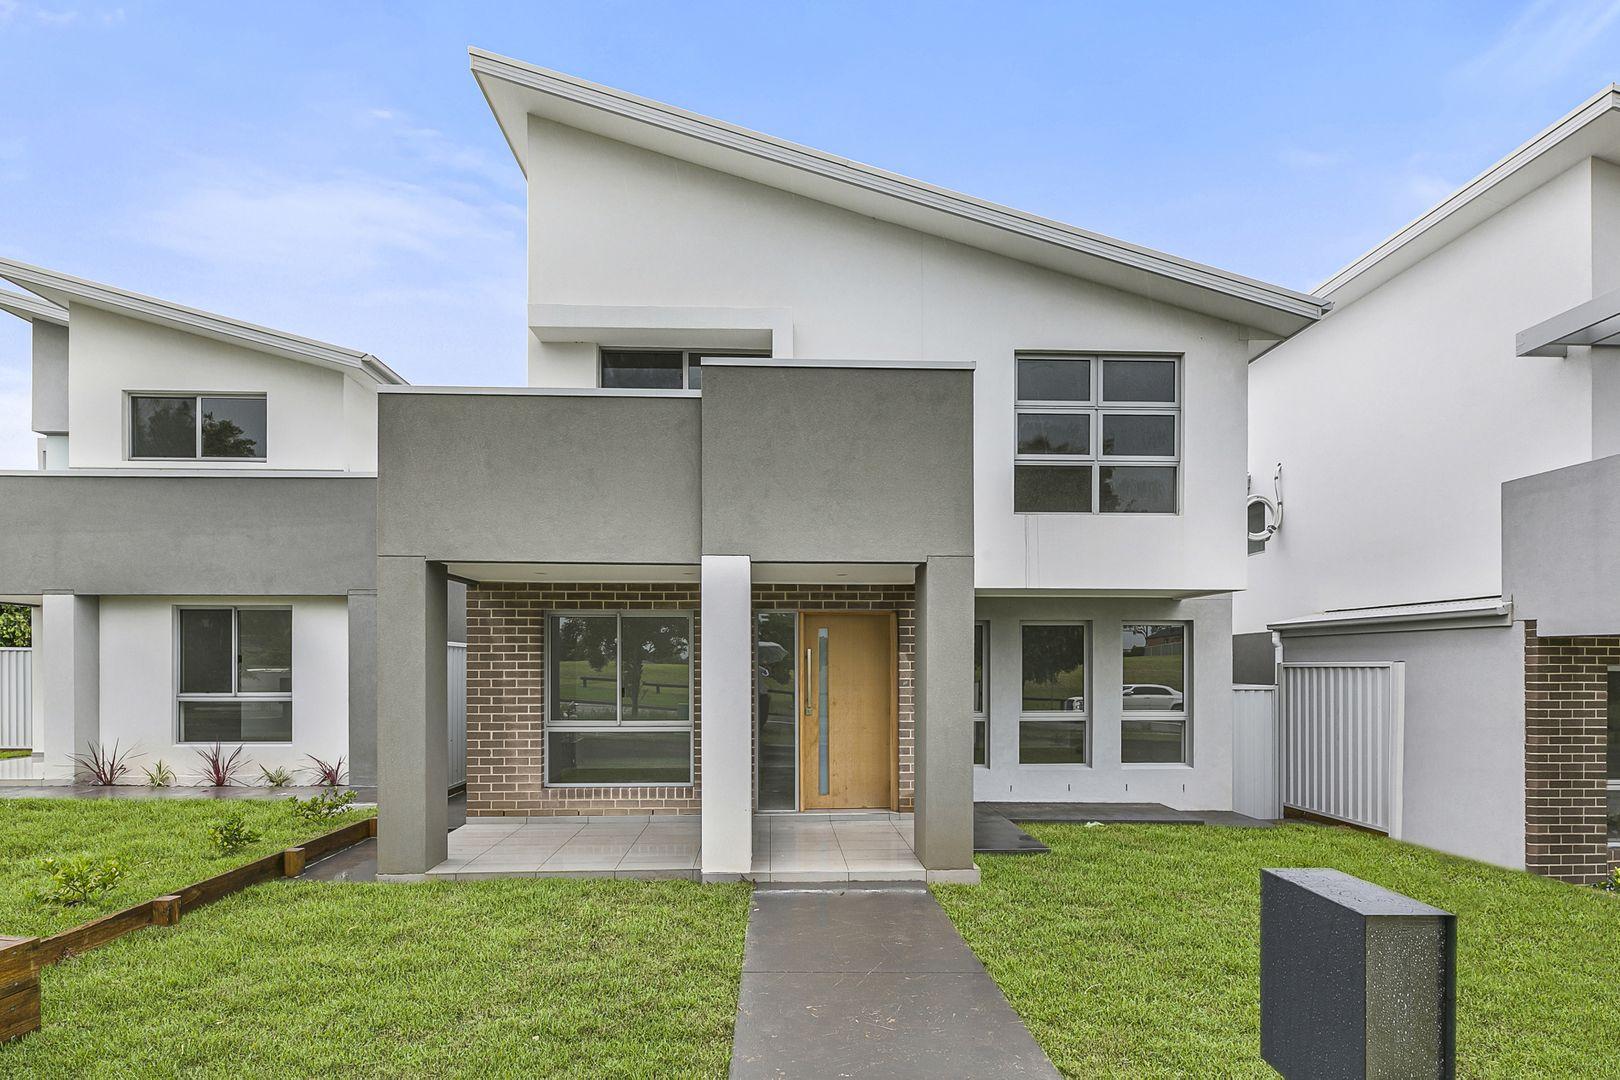 Lot 2/22 Northam Road, Leumeah NSW 2560, Image 0